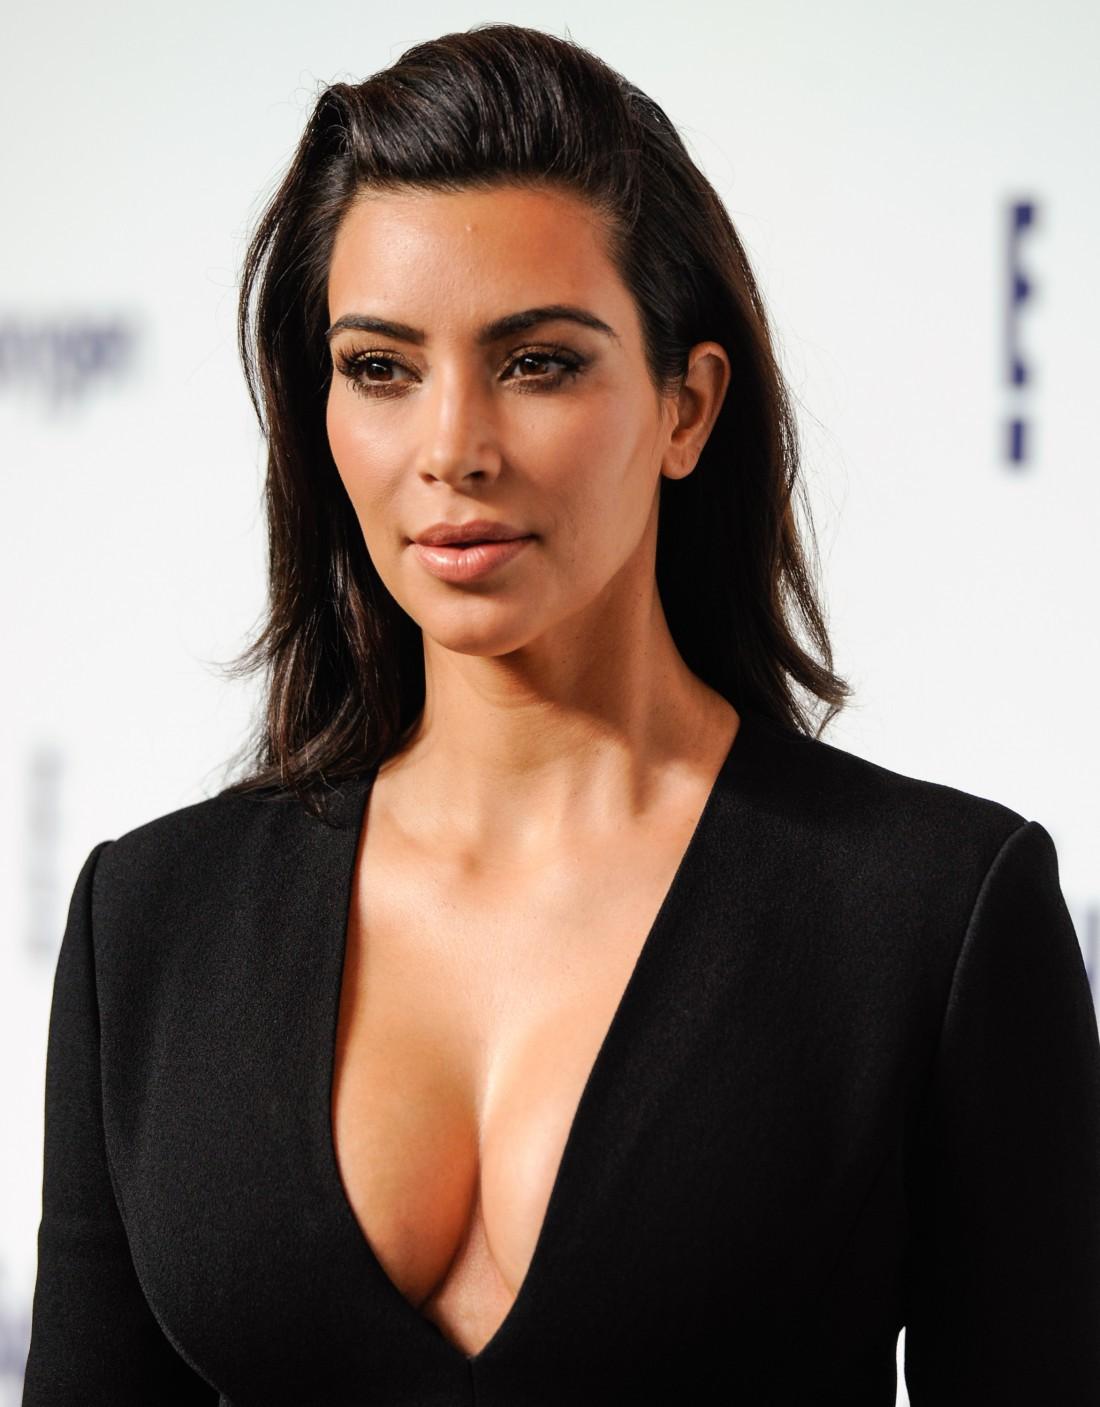 Ким Кардашян раскритиковали за рекламу рекомендации